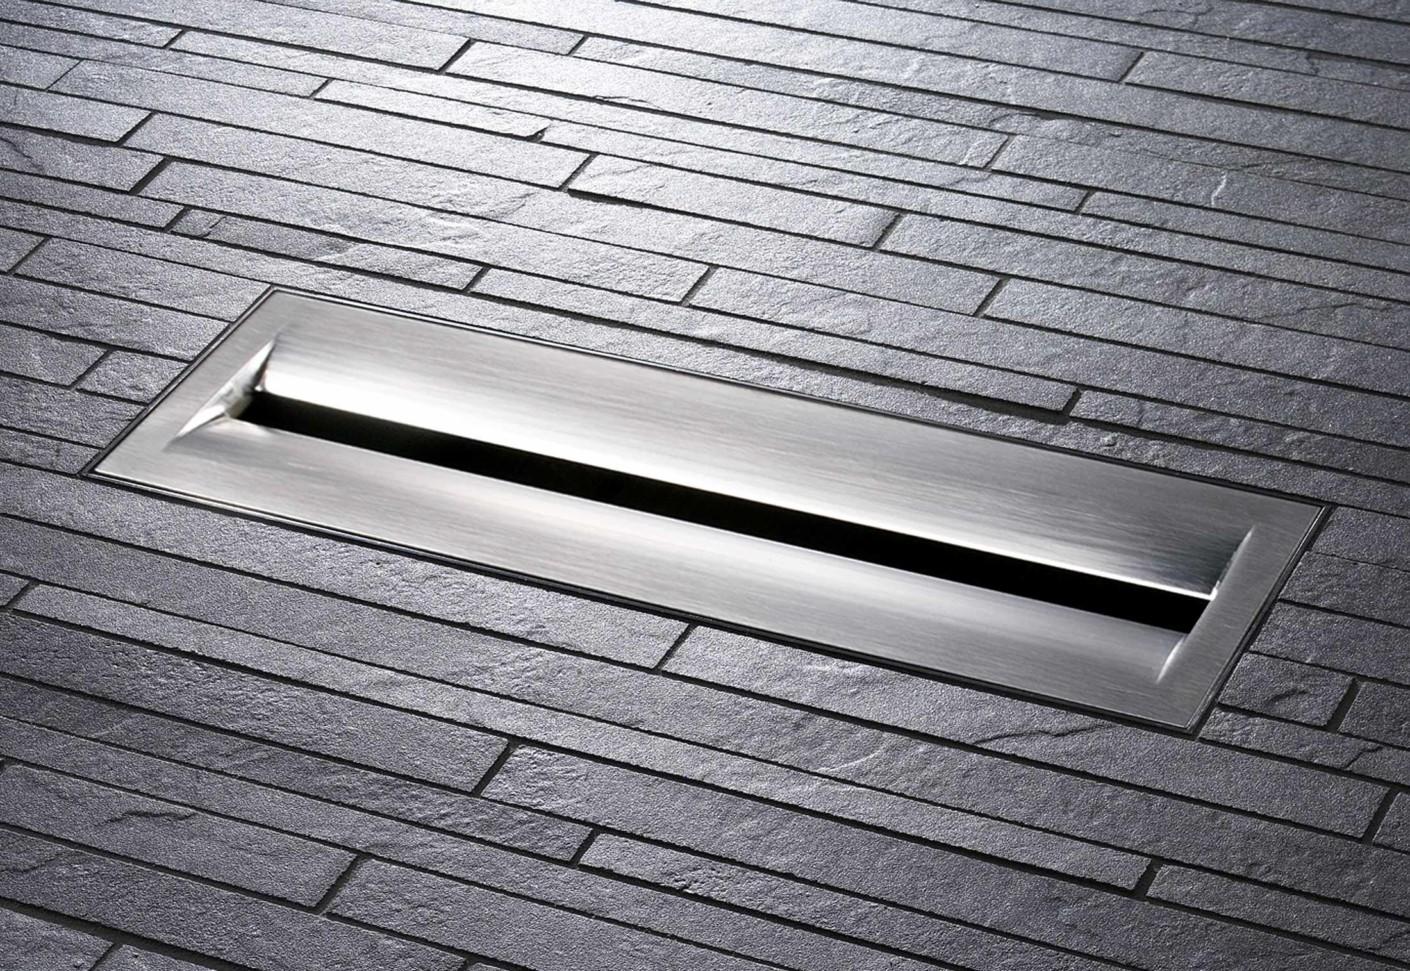 Floor drain ceraniveau with zentrix by dallmer stylepark for Ground drain